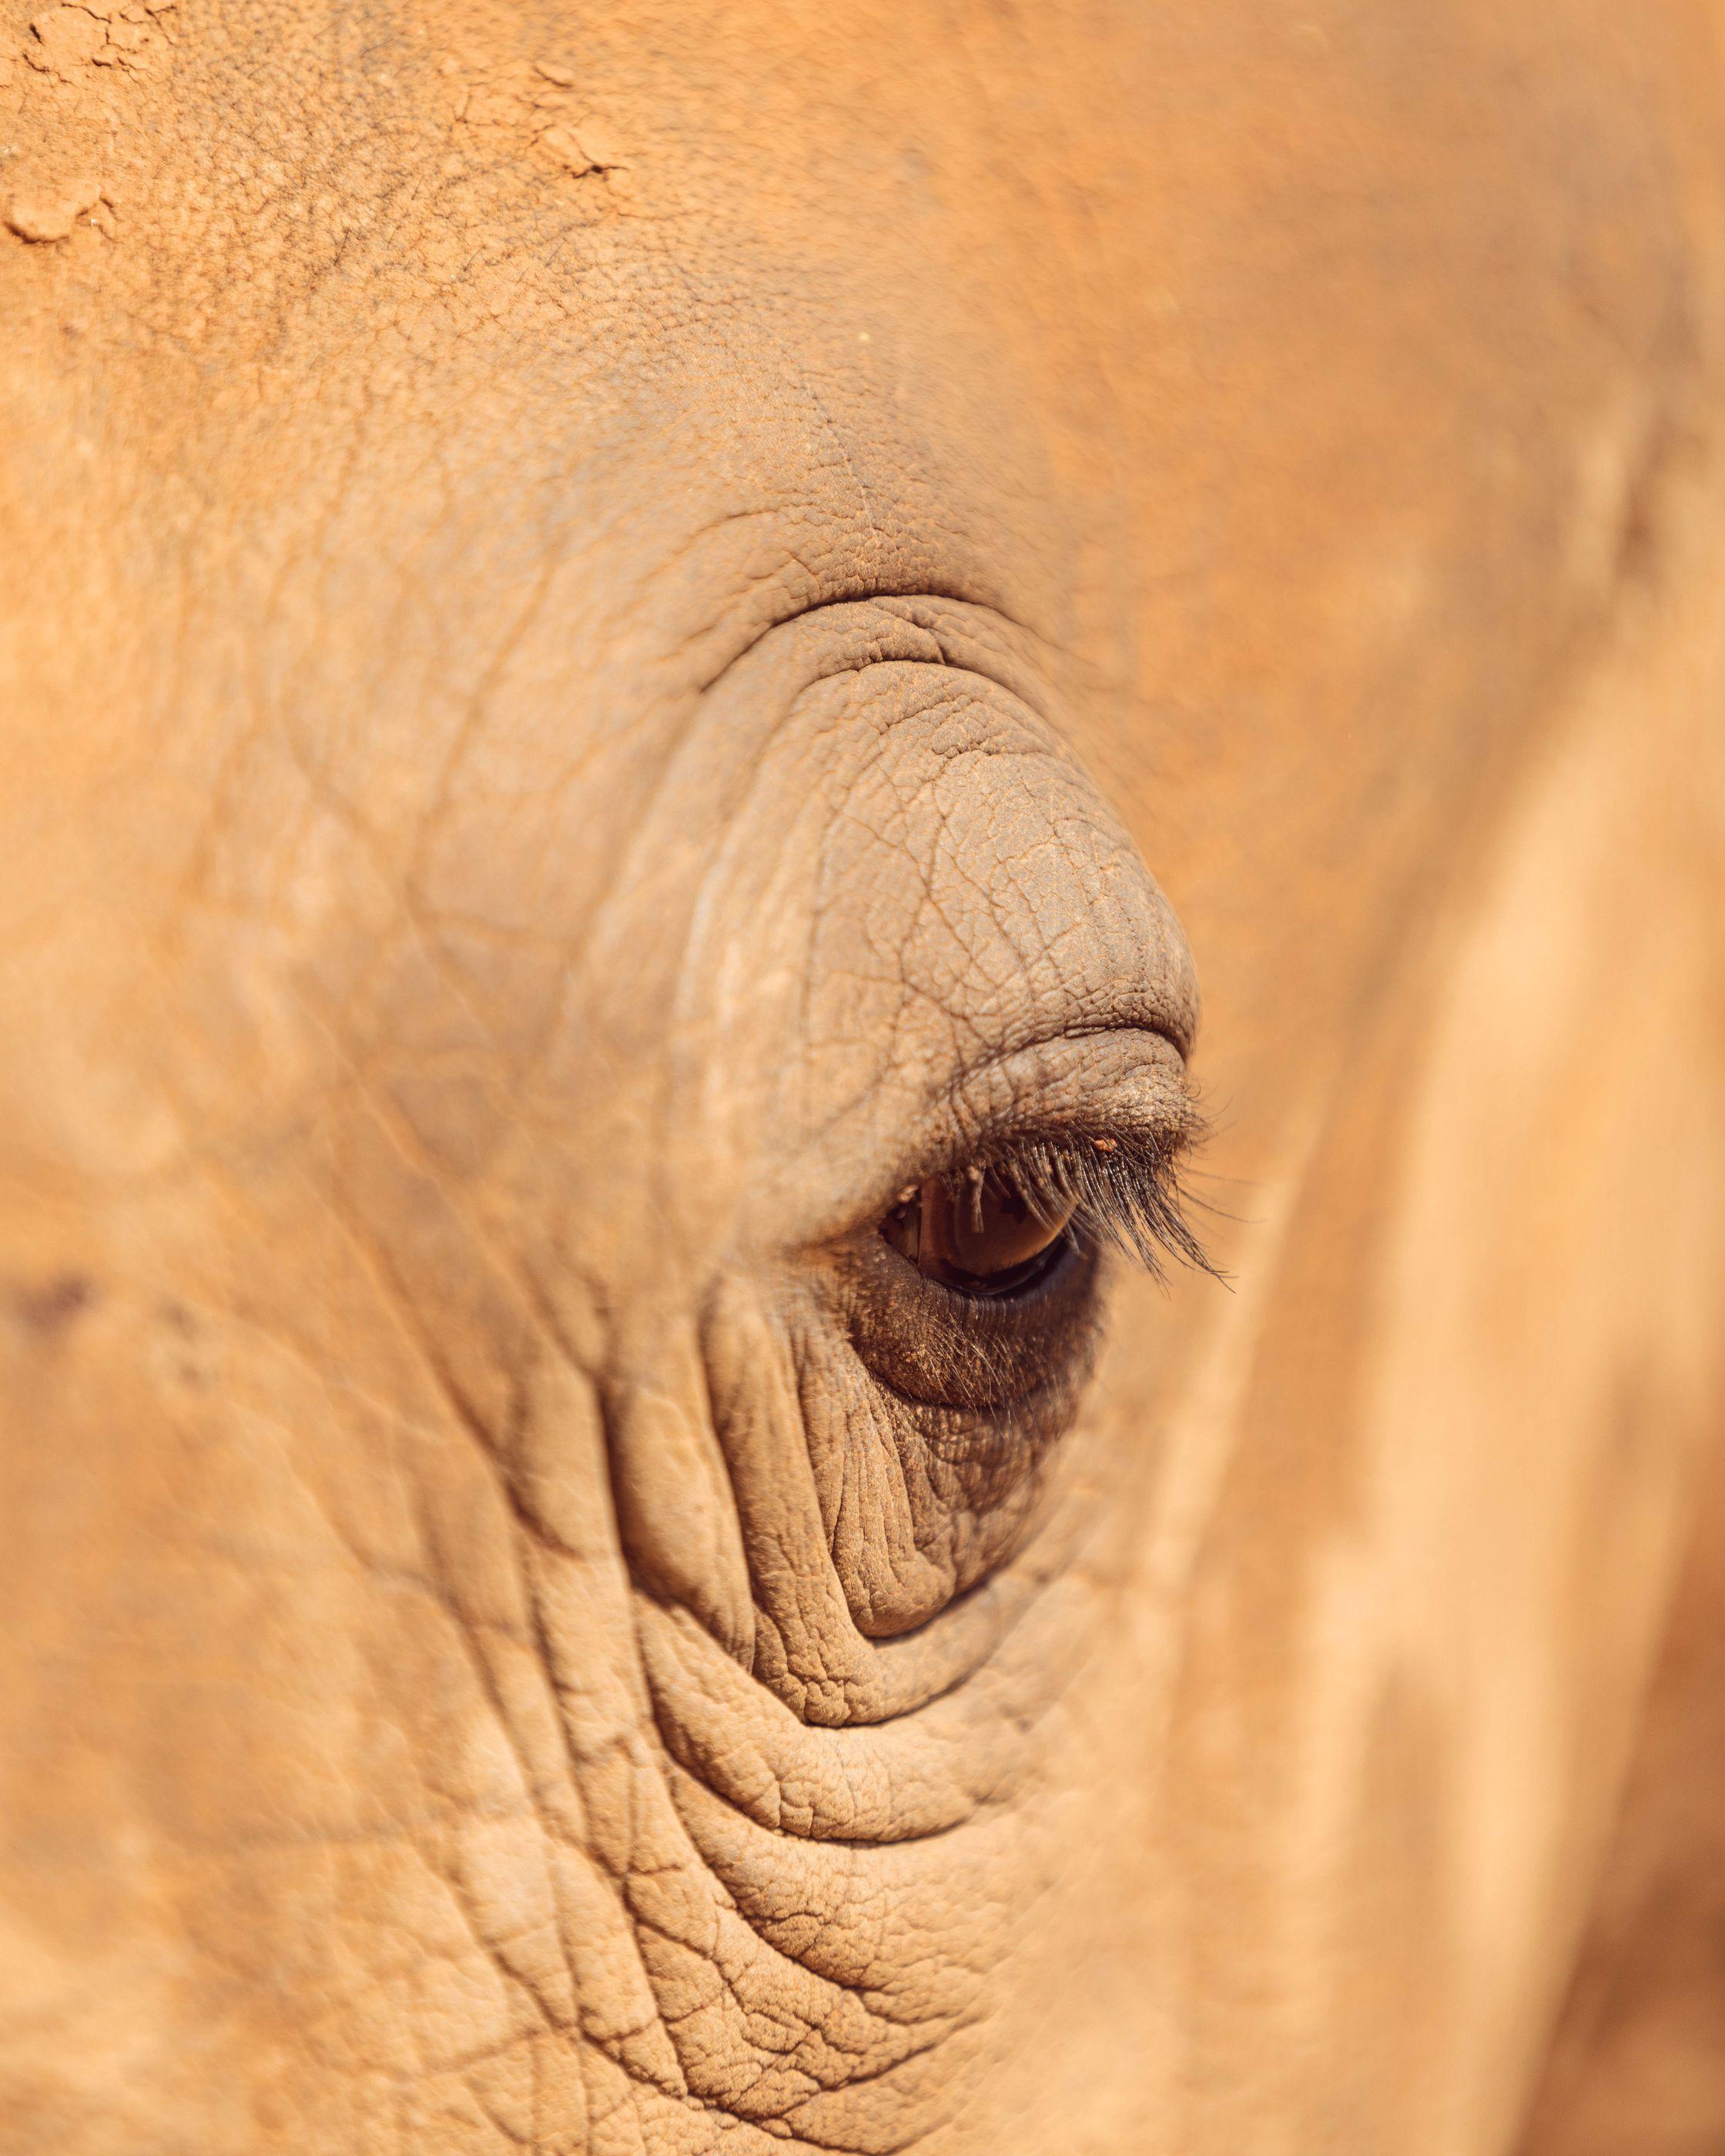 Rhino - Hublot's maiden with Kevin Pietersen in India